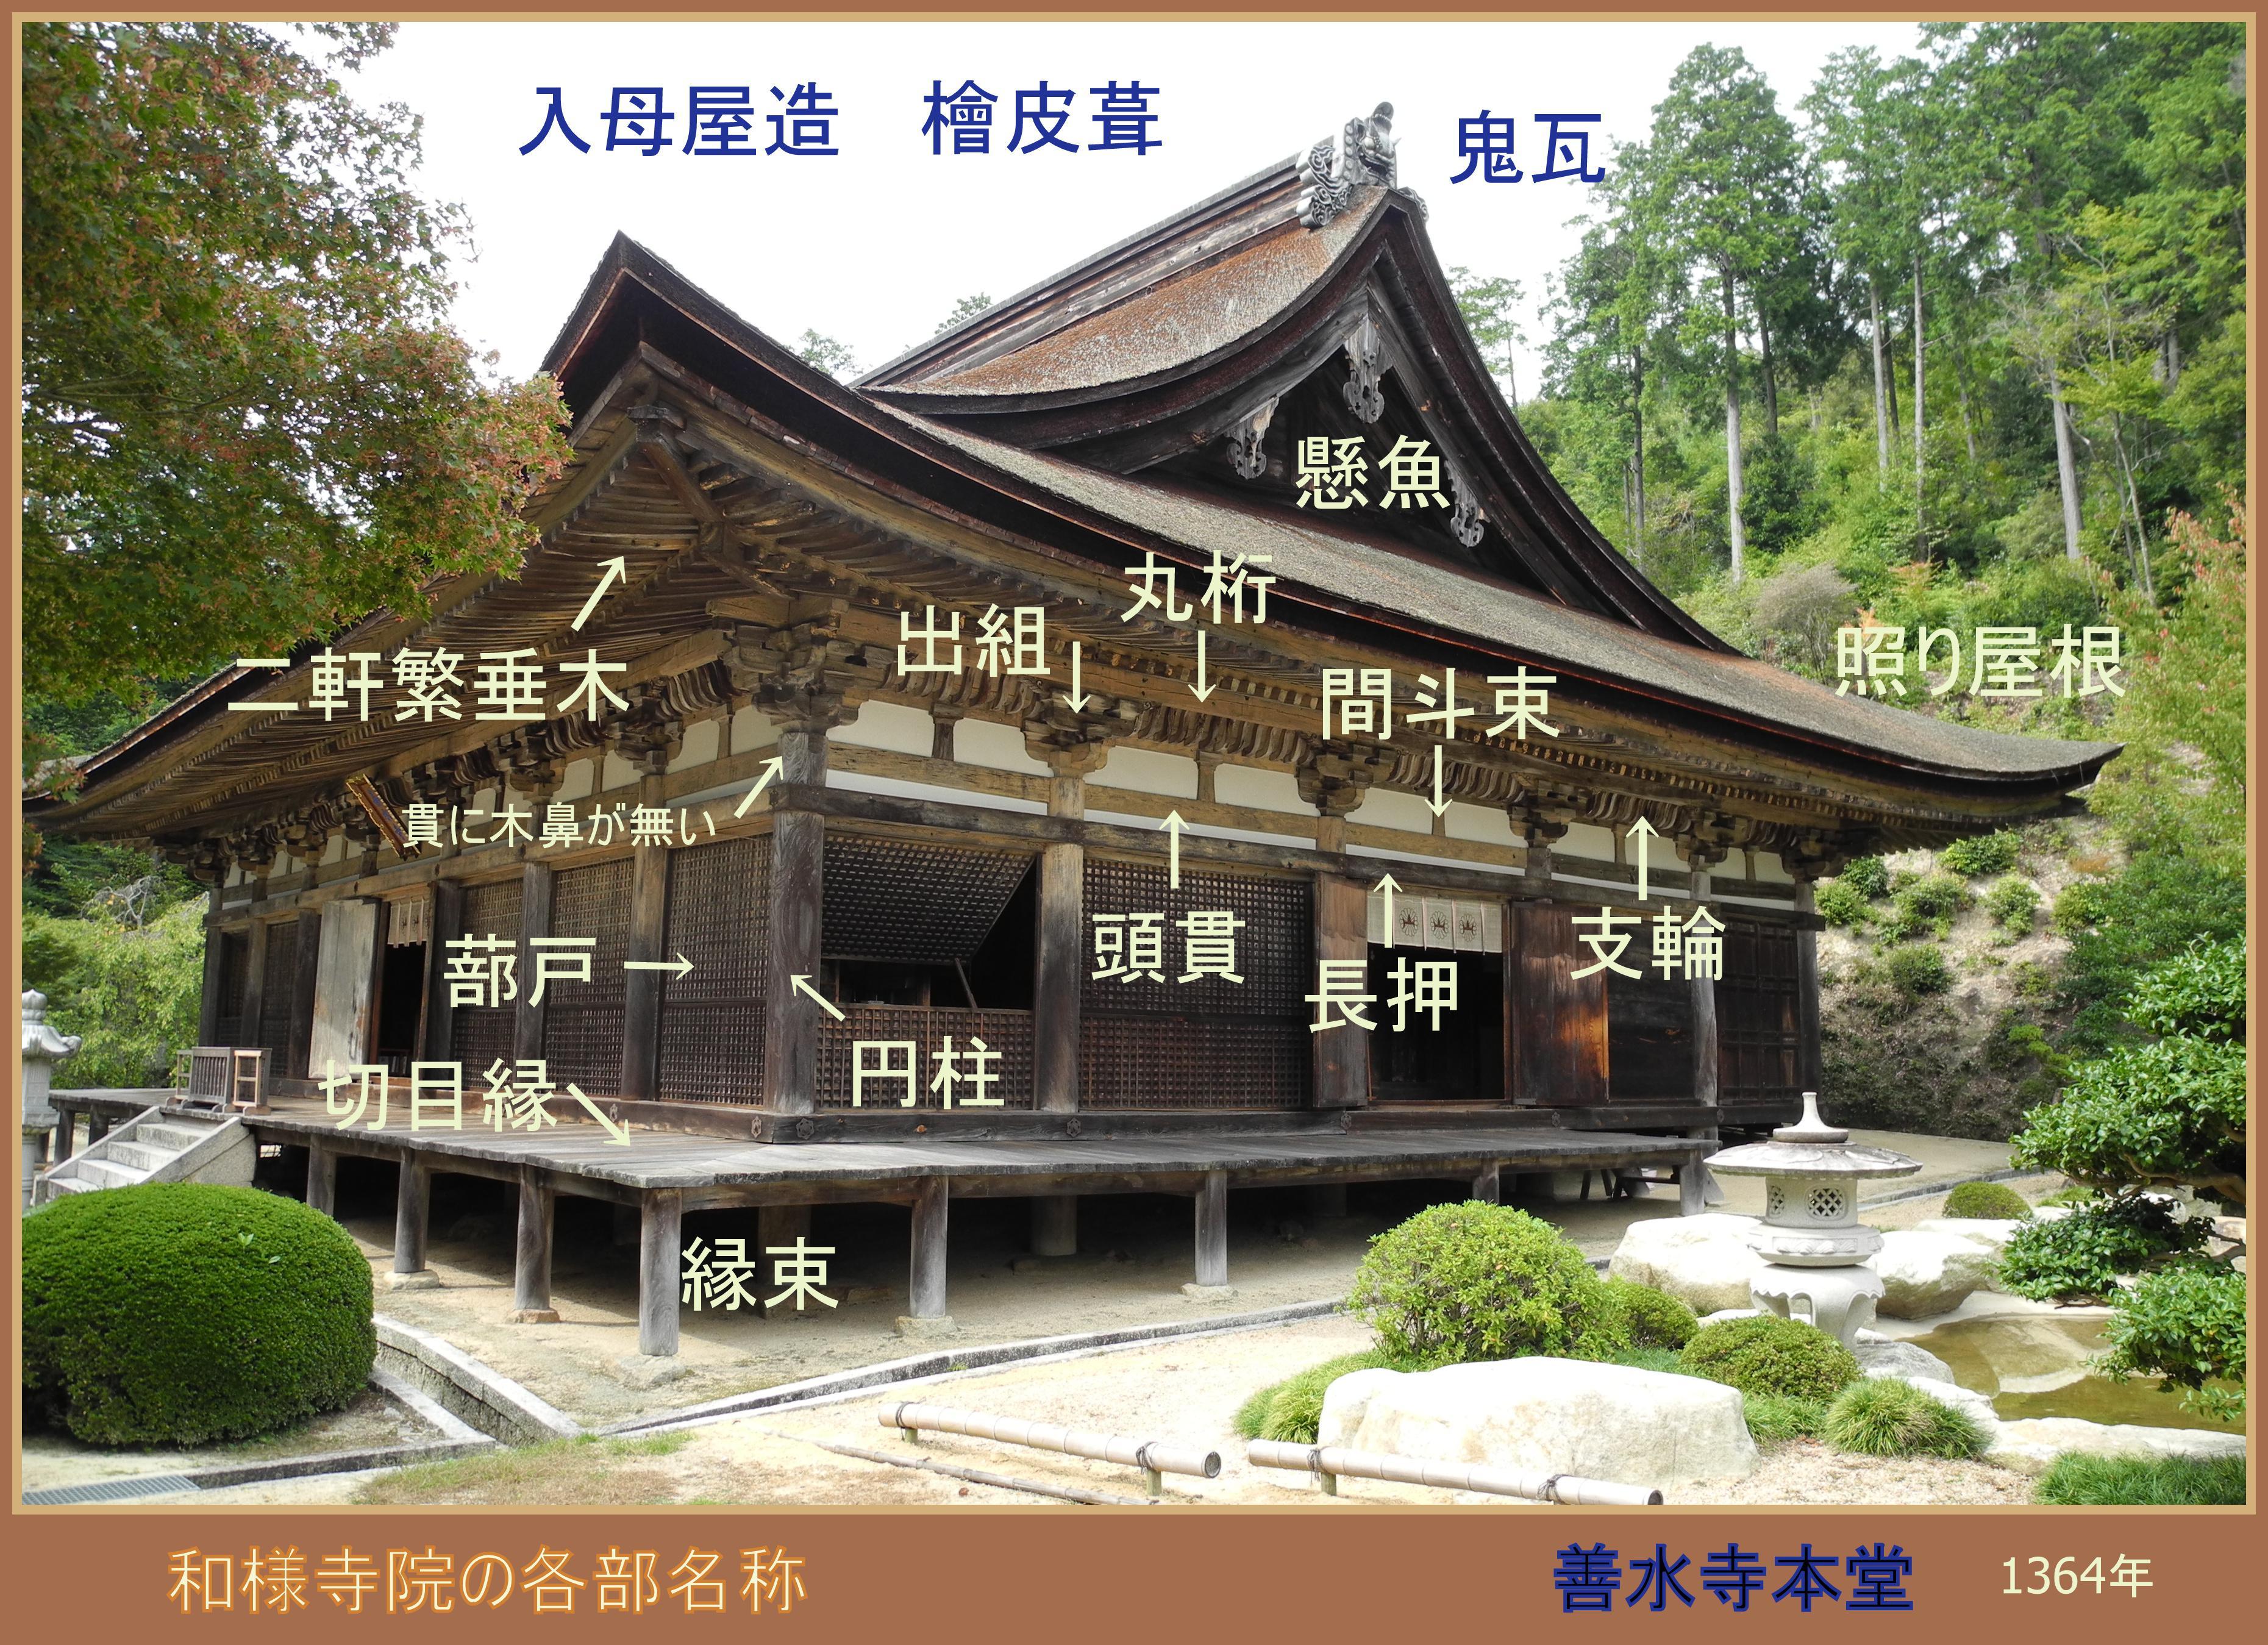 a11和様組物ー善水寺